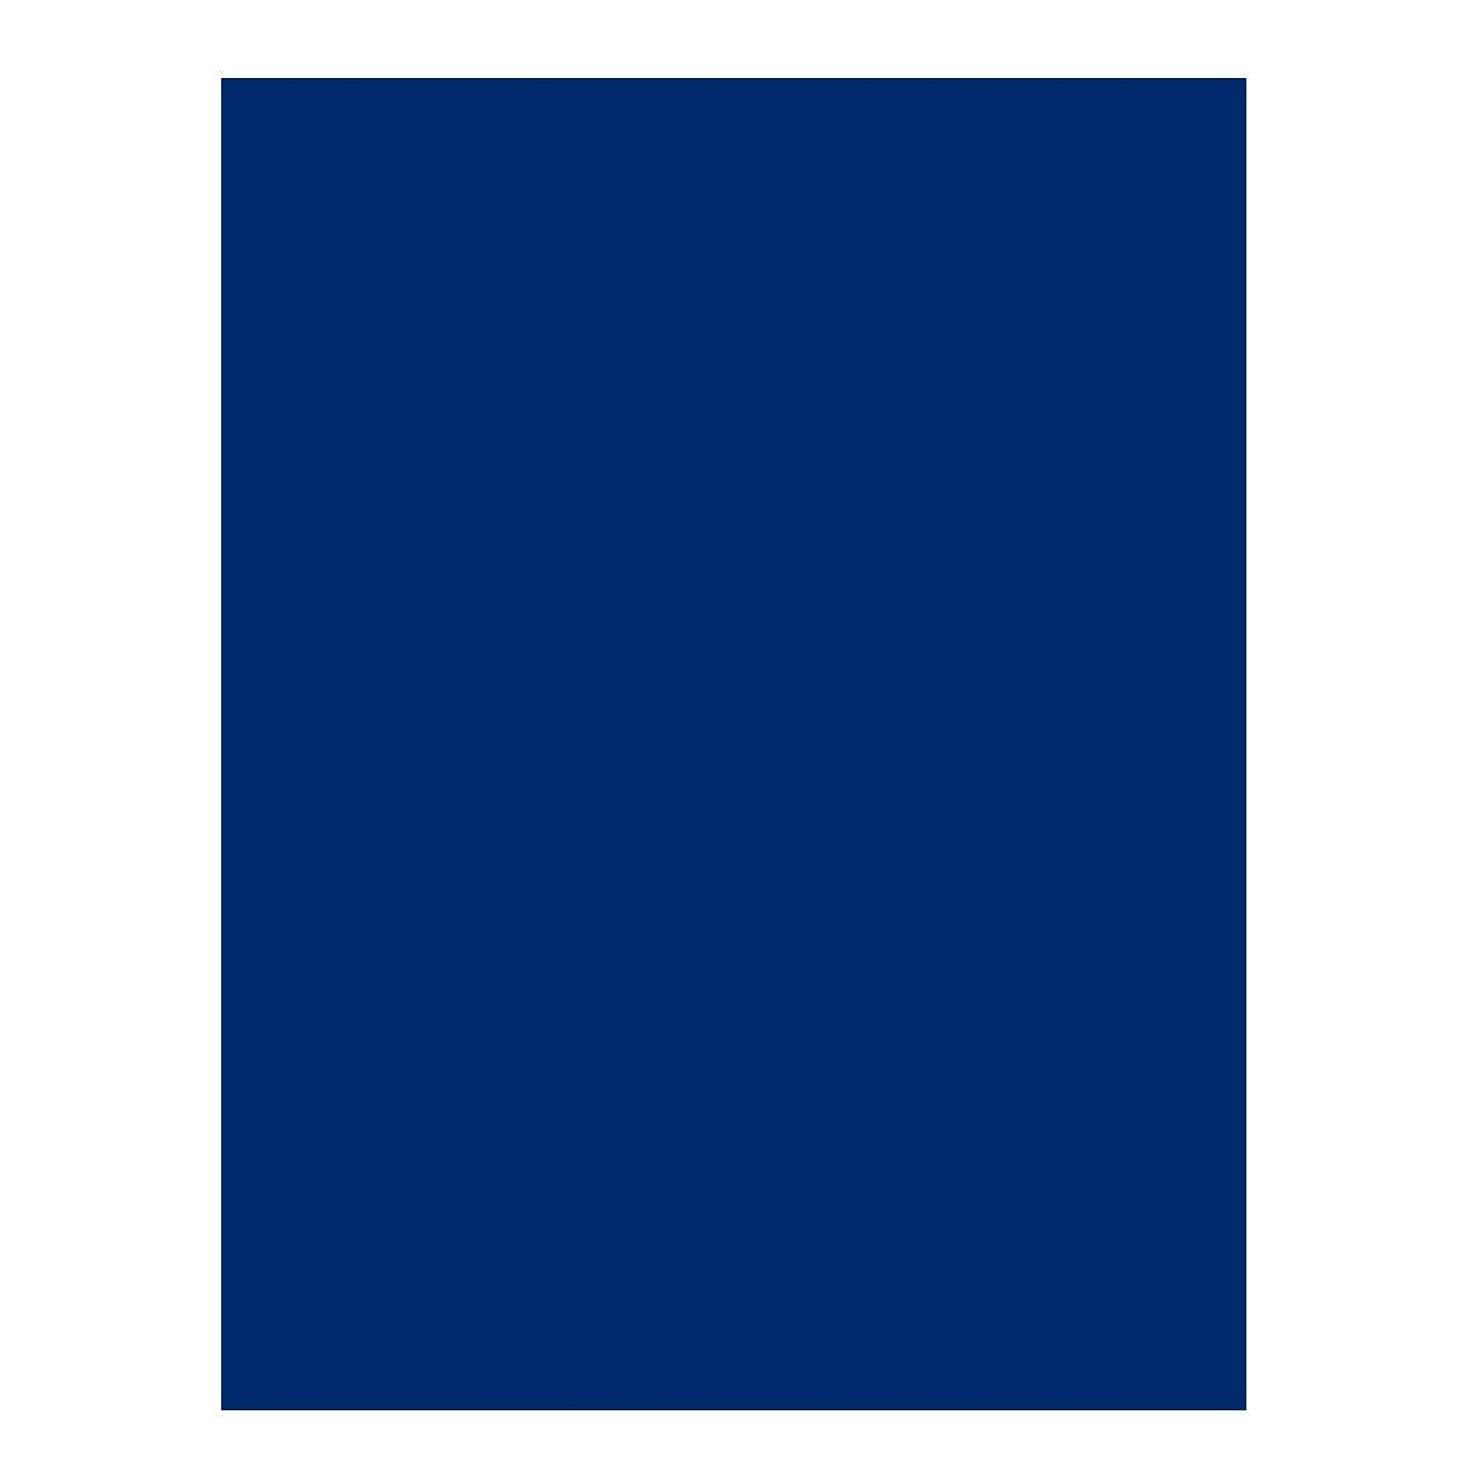 CAMPUS University 630507?–?Card Stock, 200?g, Pack of 25, 50?x 65?cm, ultramarine blue